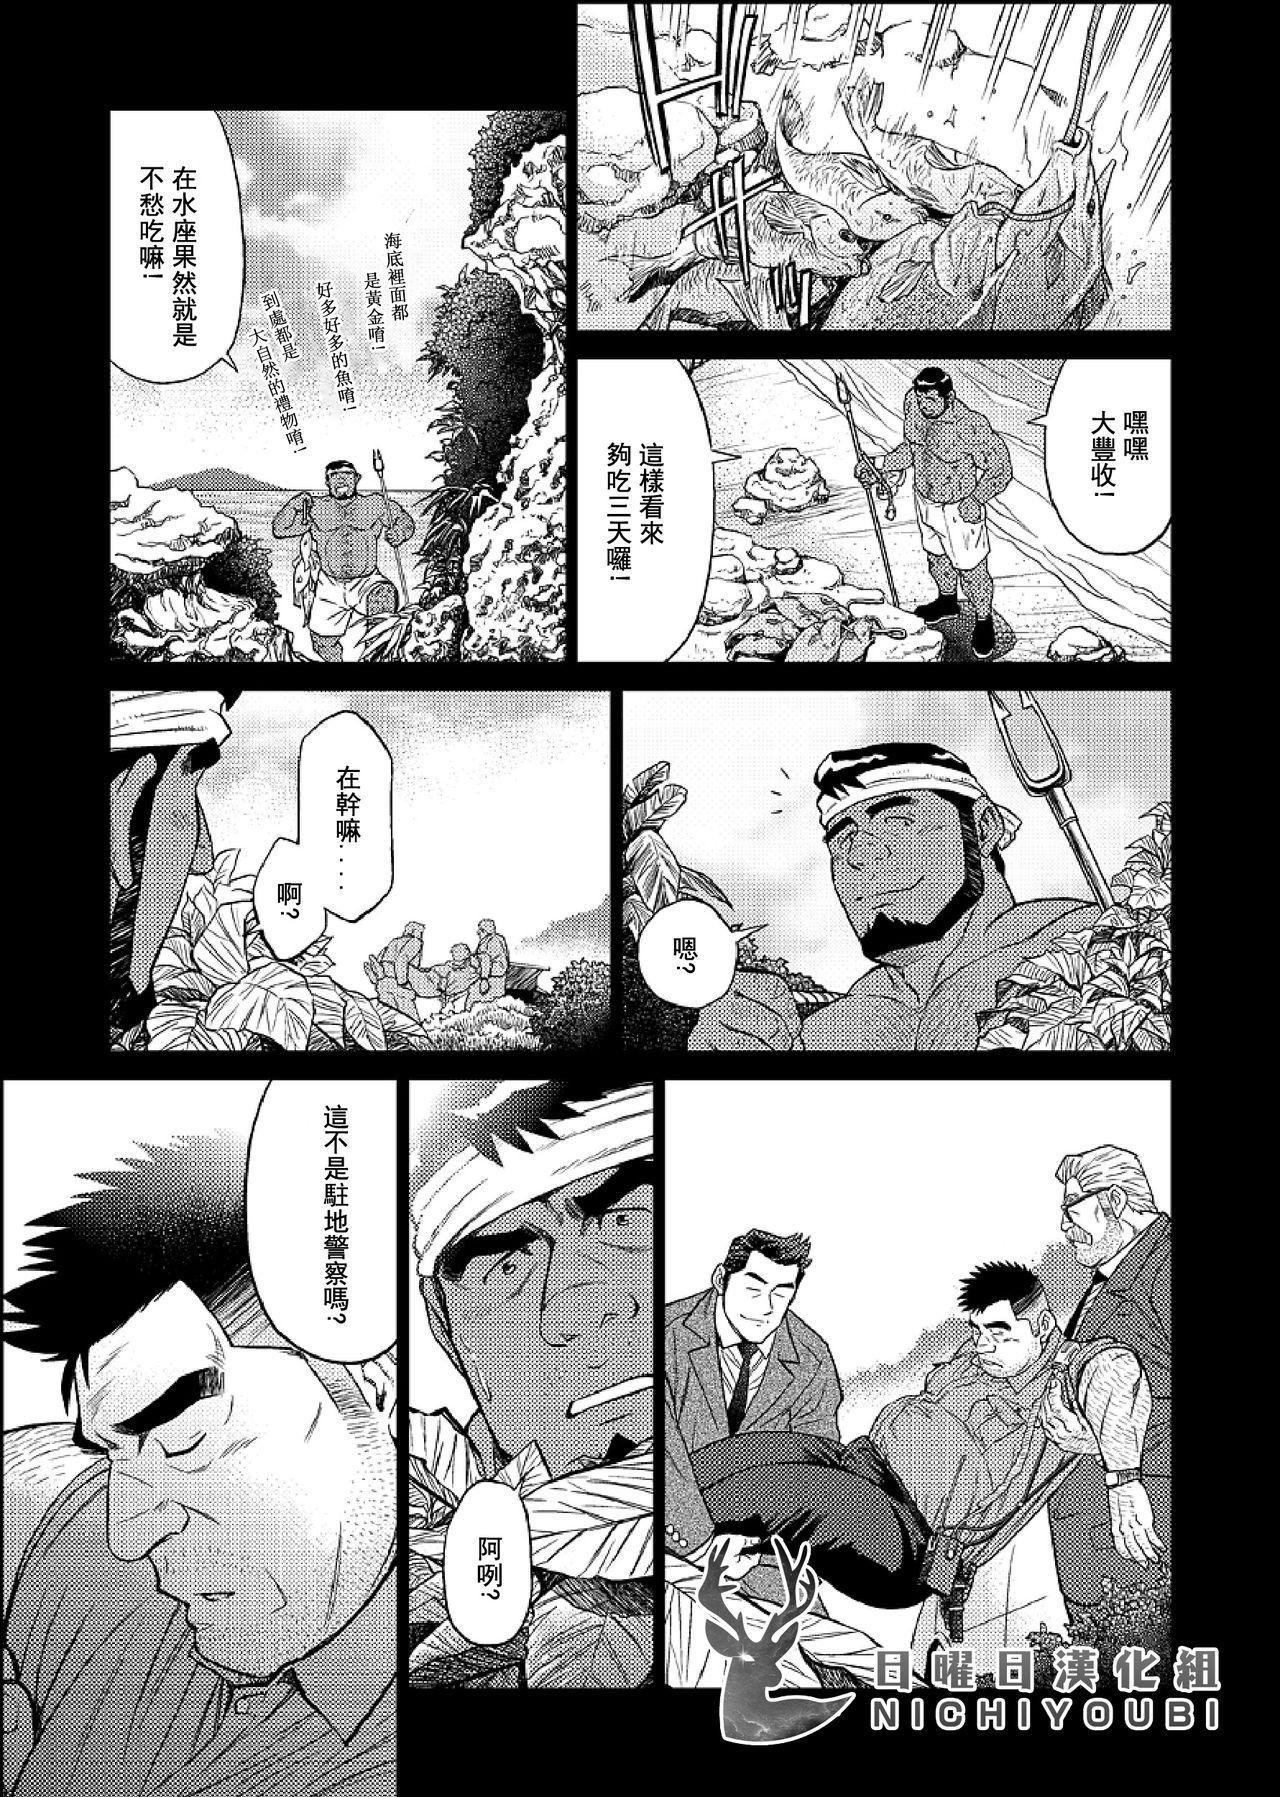 Okinawa Slave Island 04 | 冲绳奴隶岛 04 9